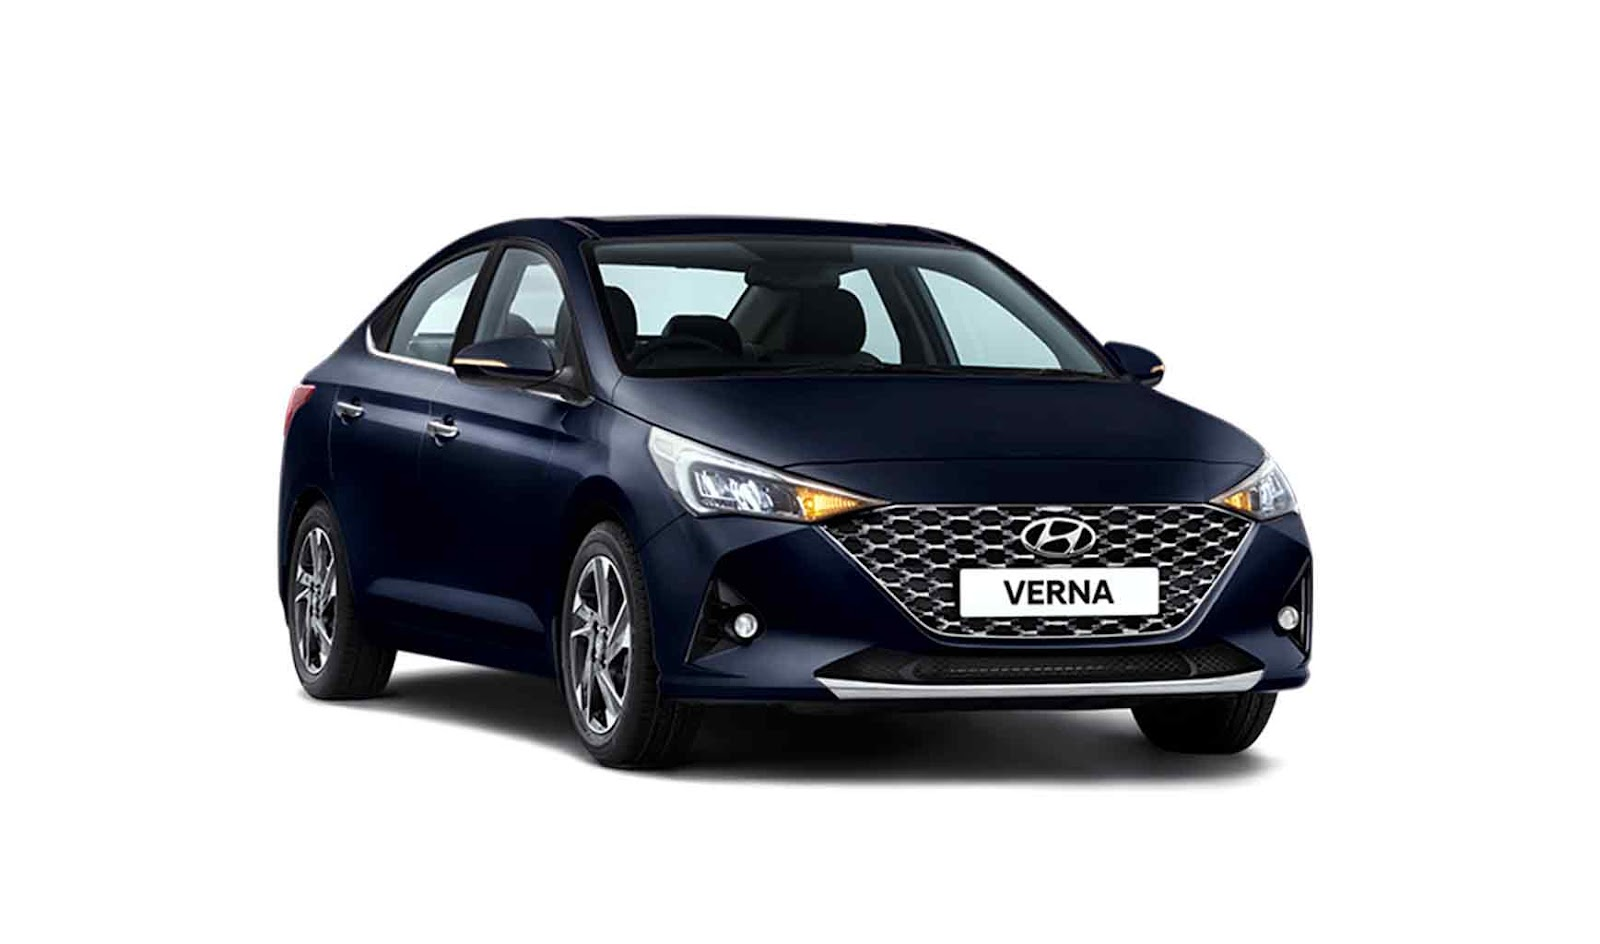 Best Quality Mid-Size Sedan in India - Hyundai Verna